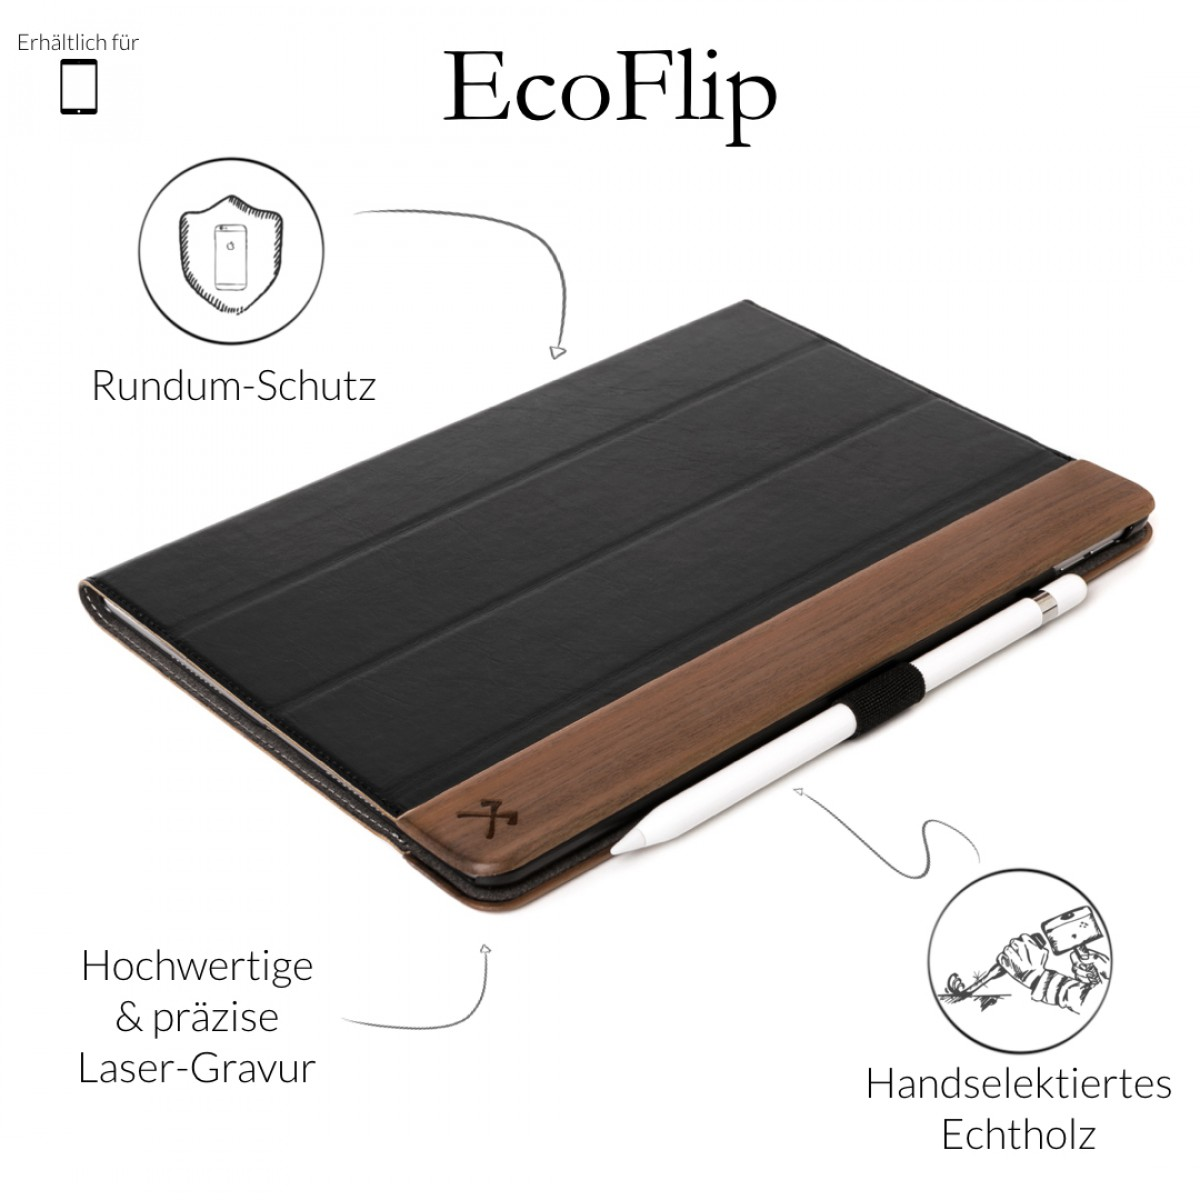 Woodcessories - EcoFlip iPad - Premium Design Case, Cover, Hülle für das iPad aus Walnuss Holz & veganem Leder (iPad Pro 12.9 (Univ. Fit 2015/17))